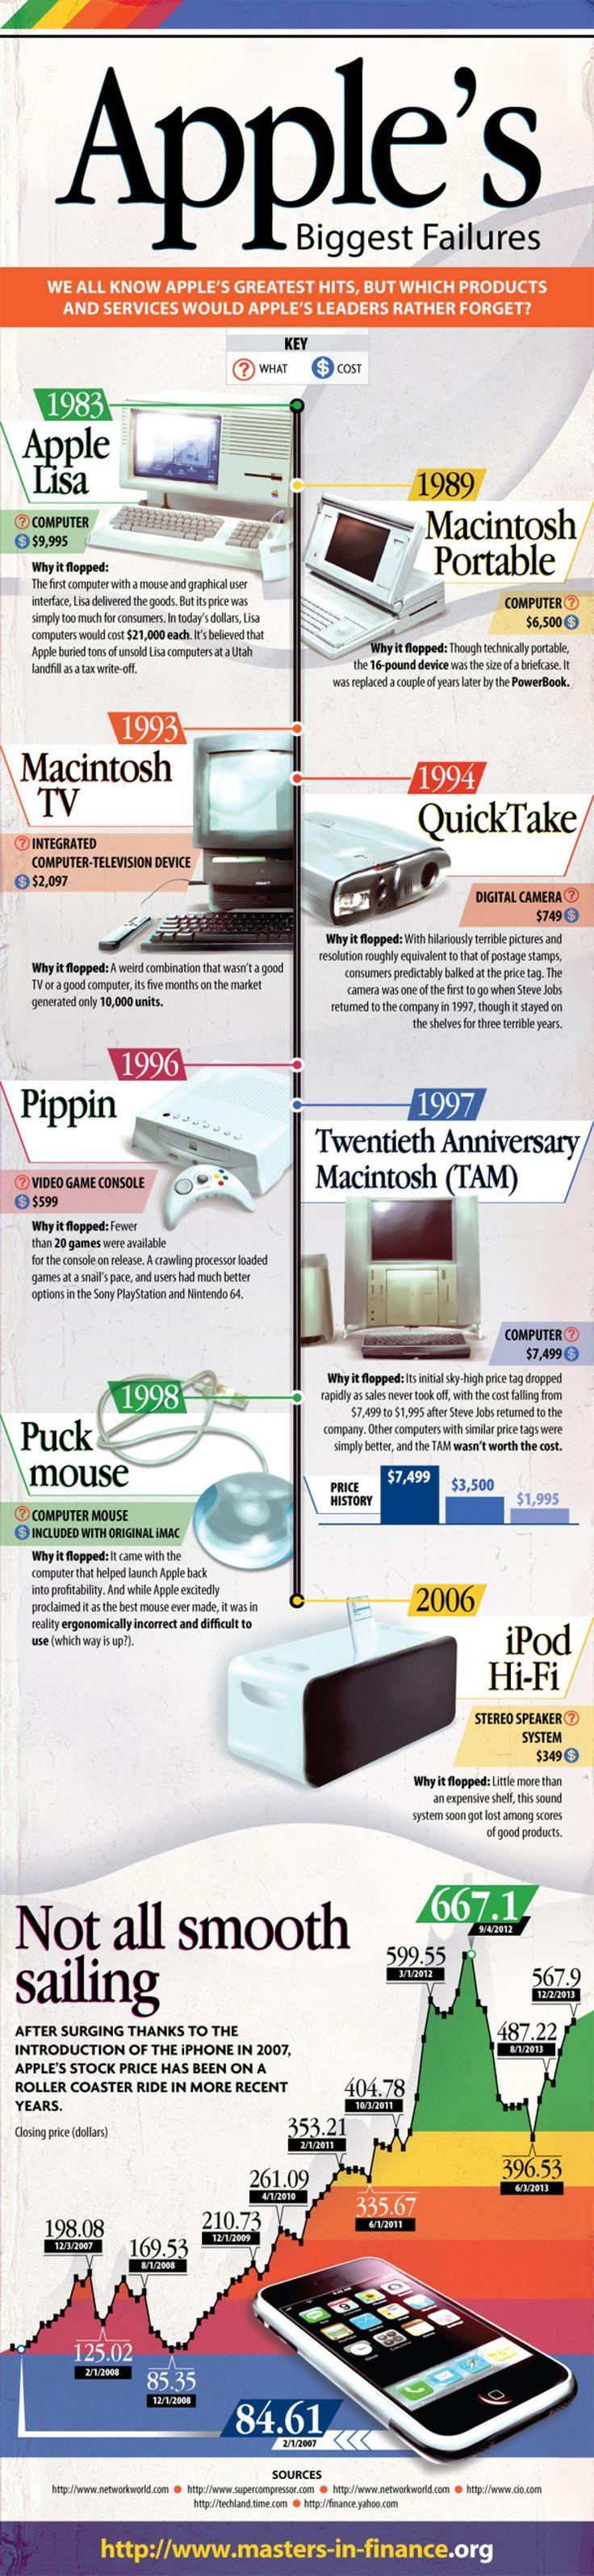 Apple's Biggest Failures #infographic